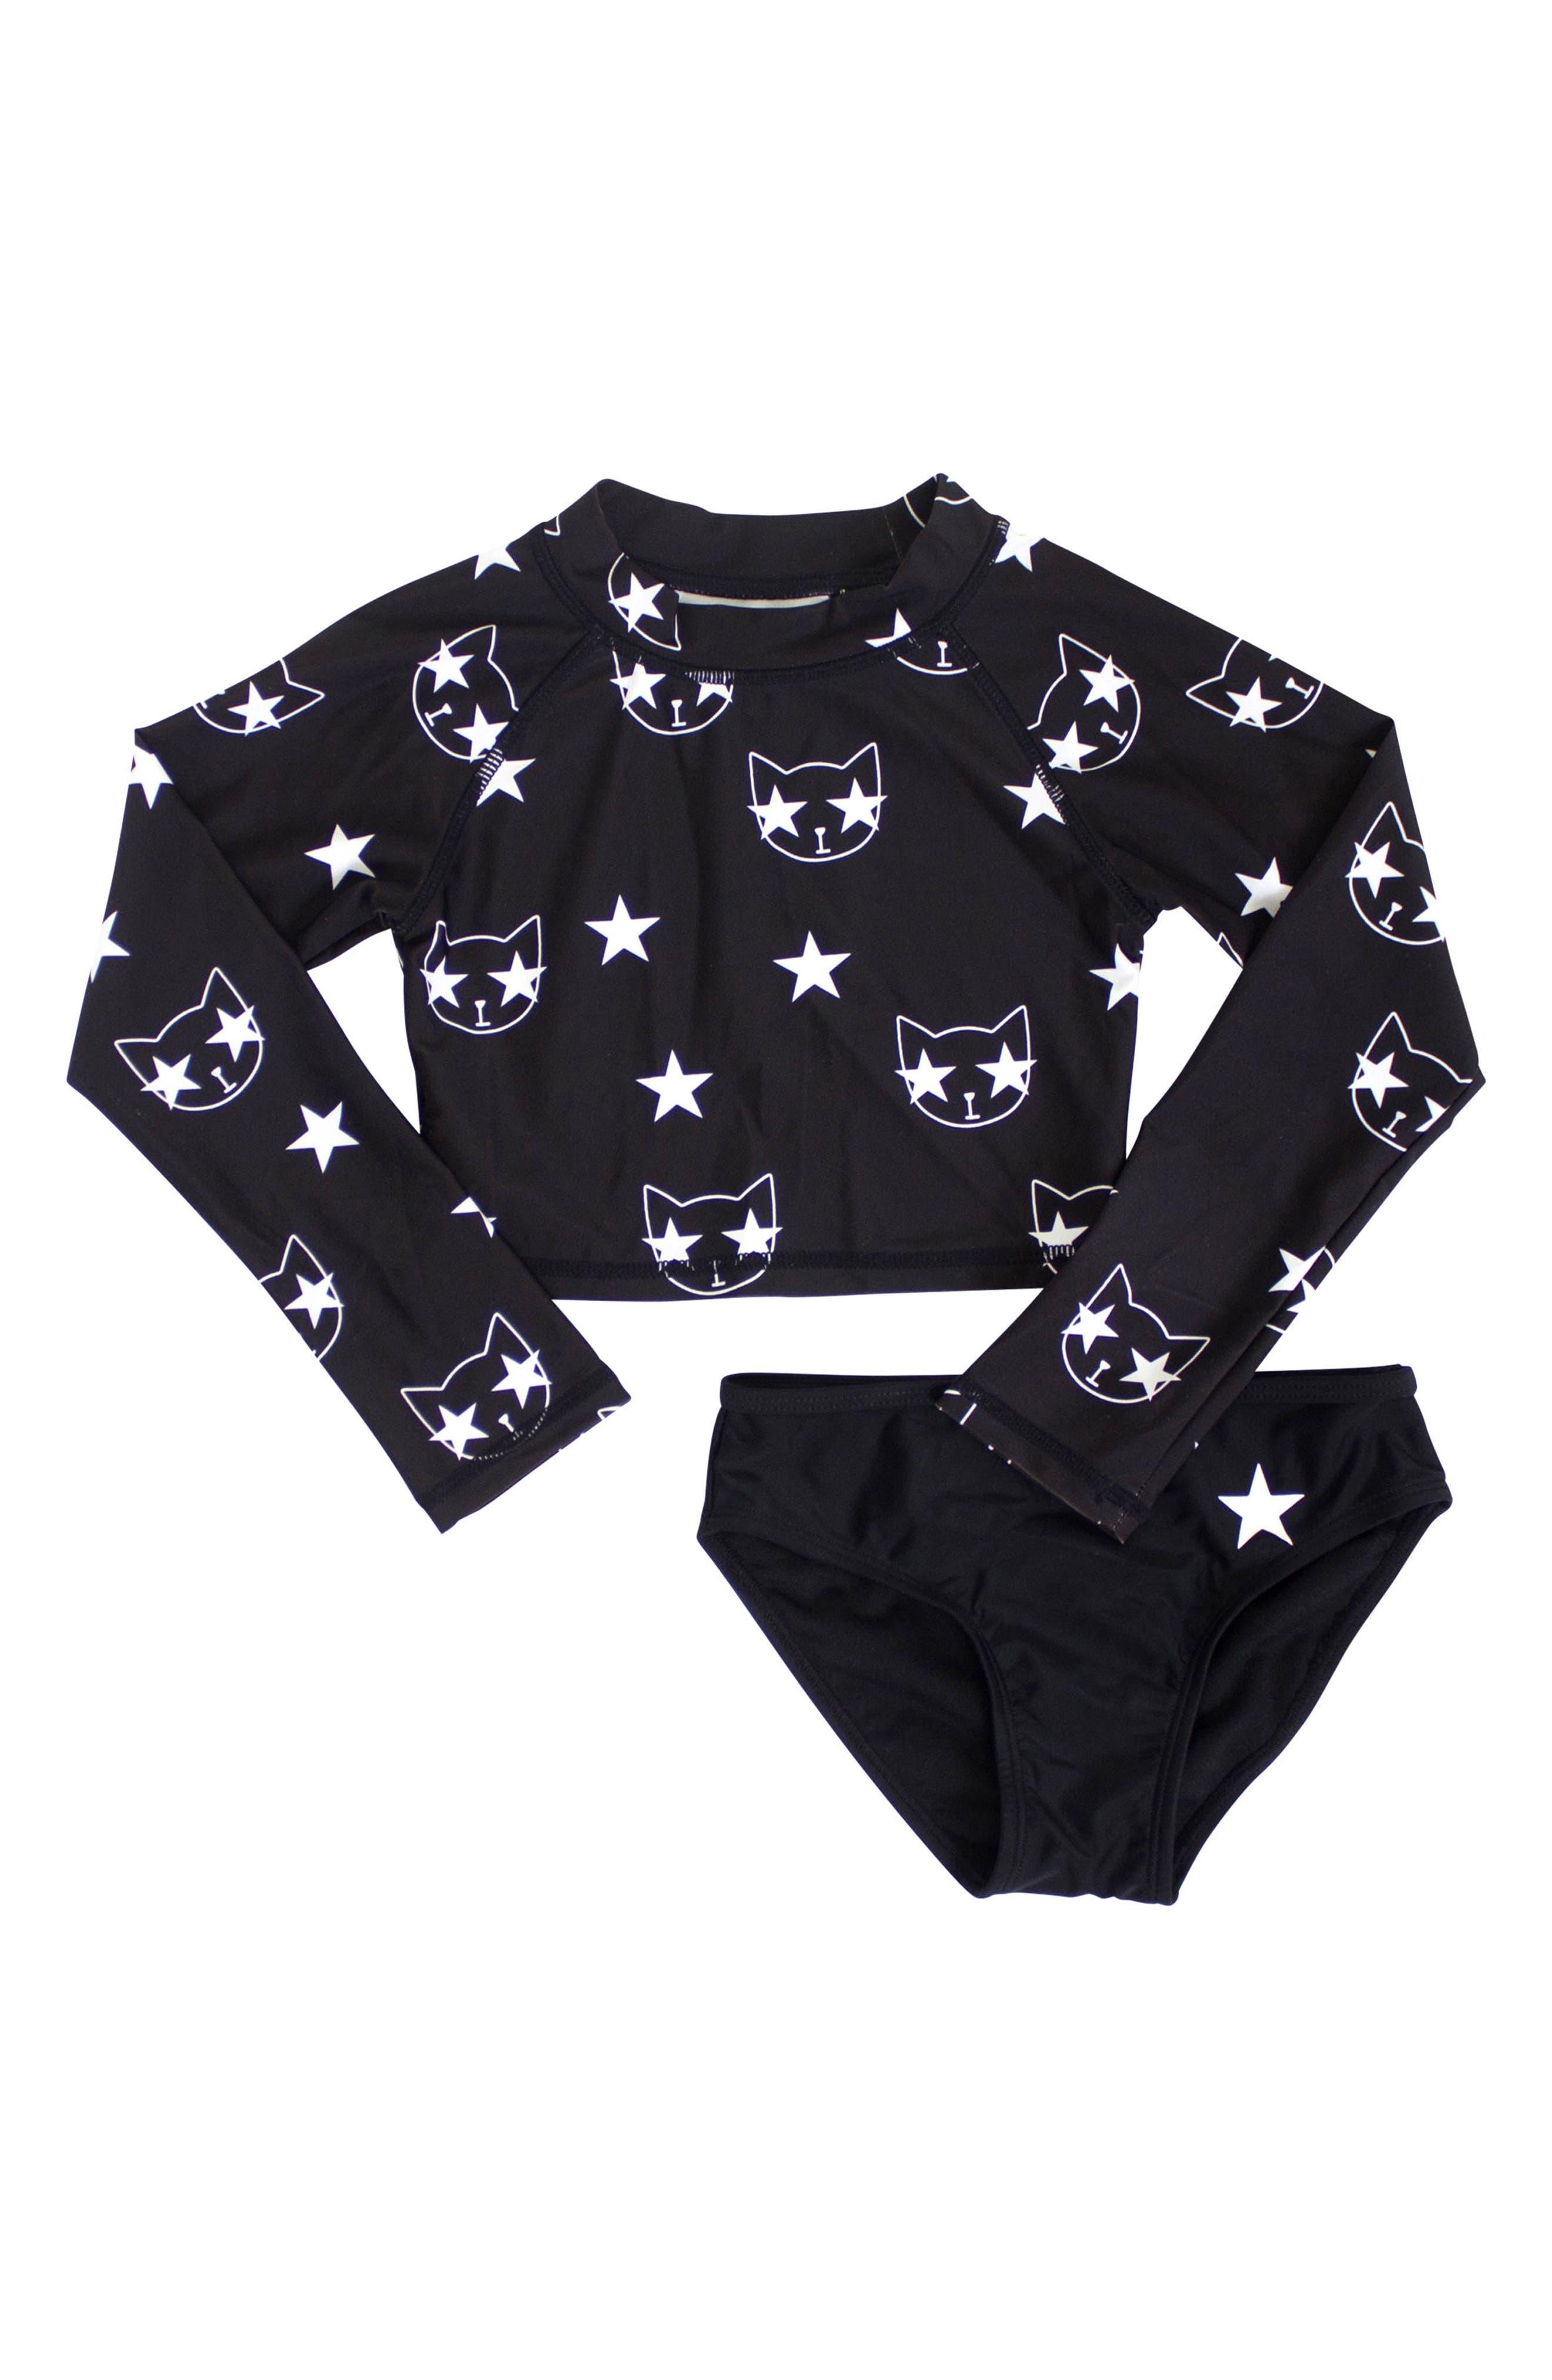 Starcat Two-Piece Rashguard Swimsuit,                         Main,                         color, 001